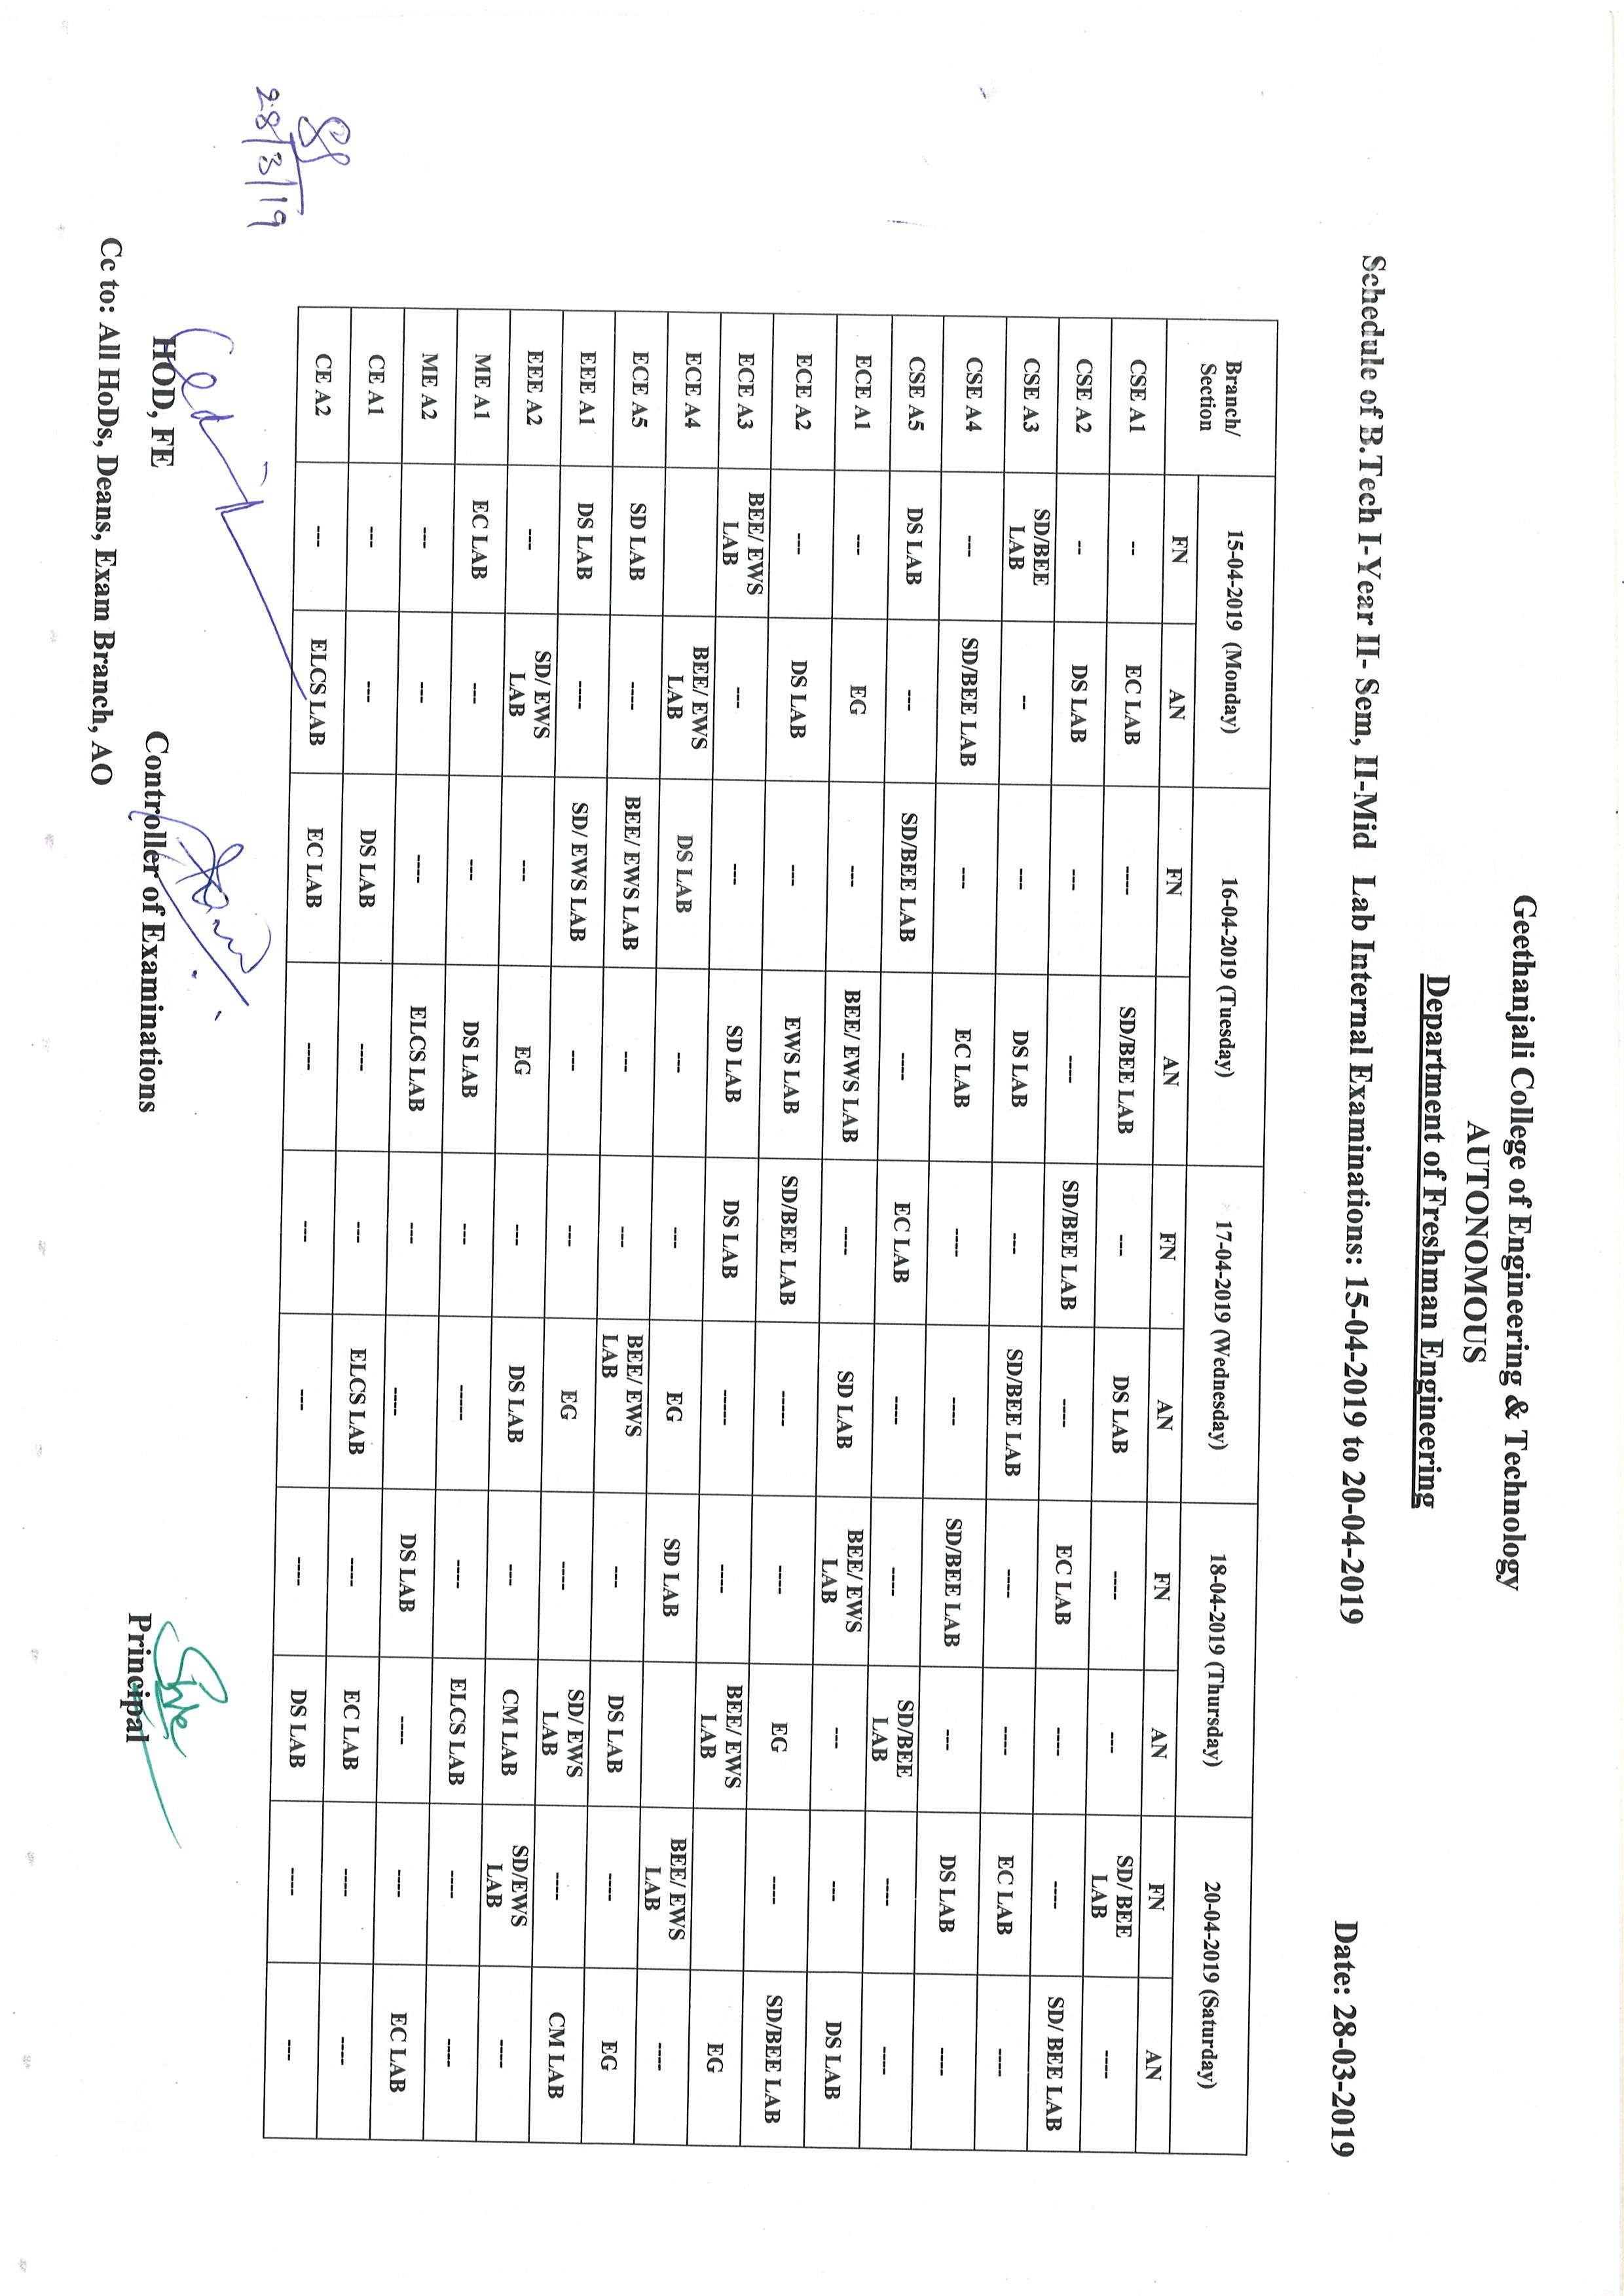 Mcq For Mba 4th Sem Pune University